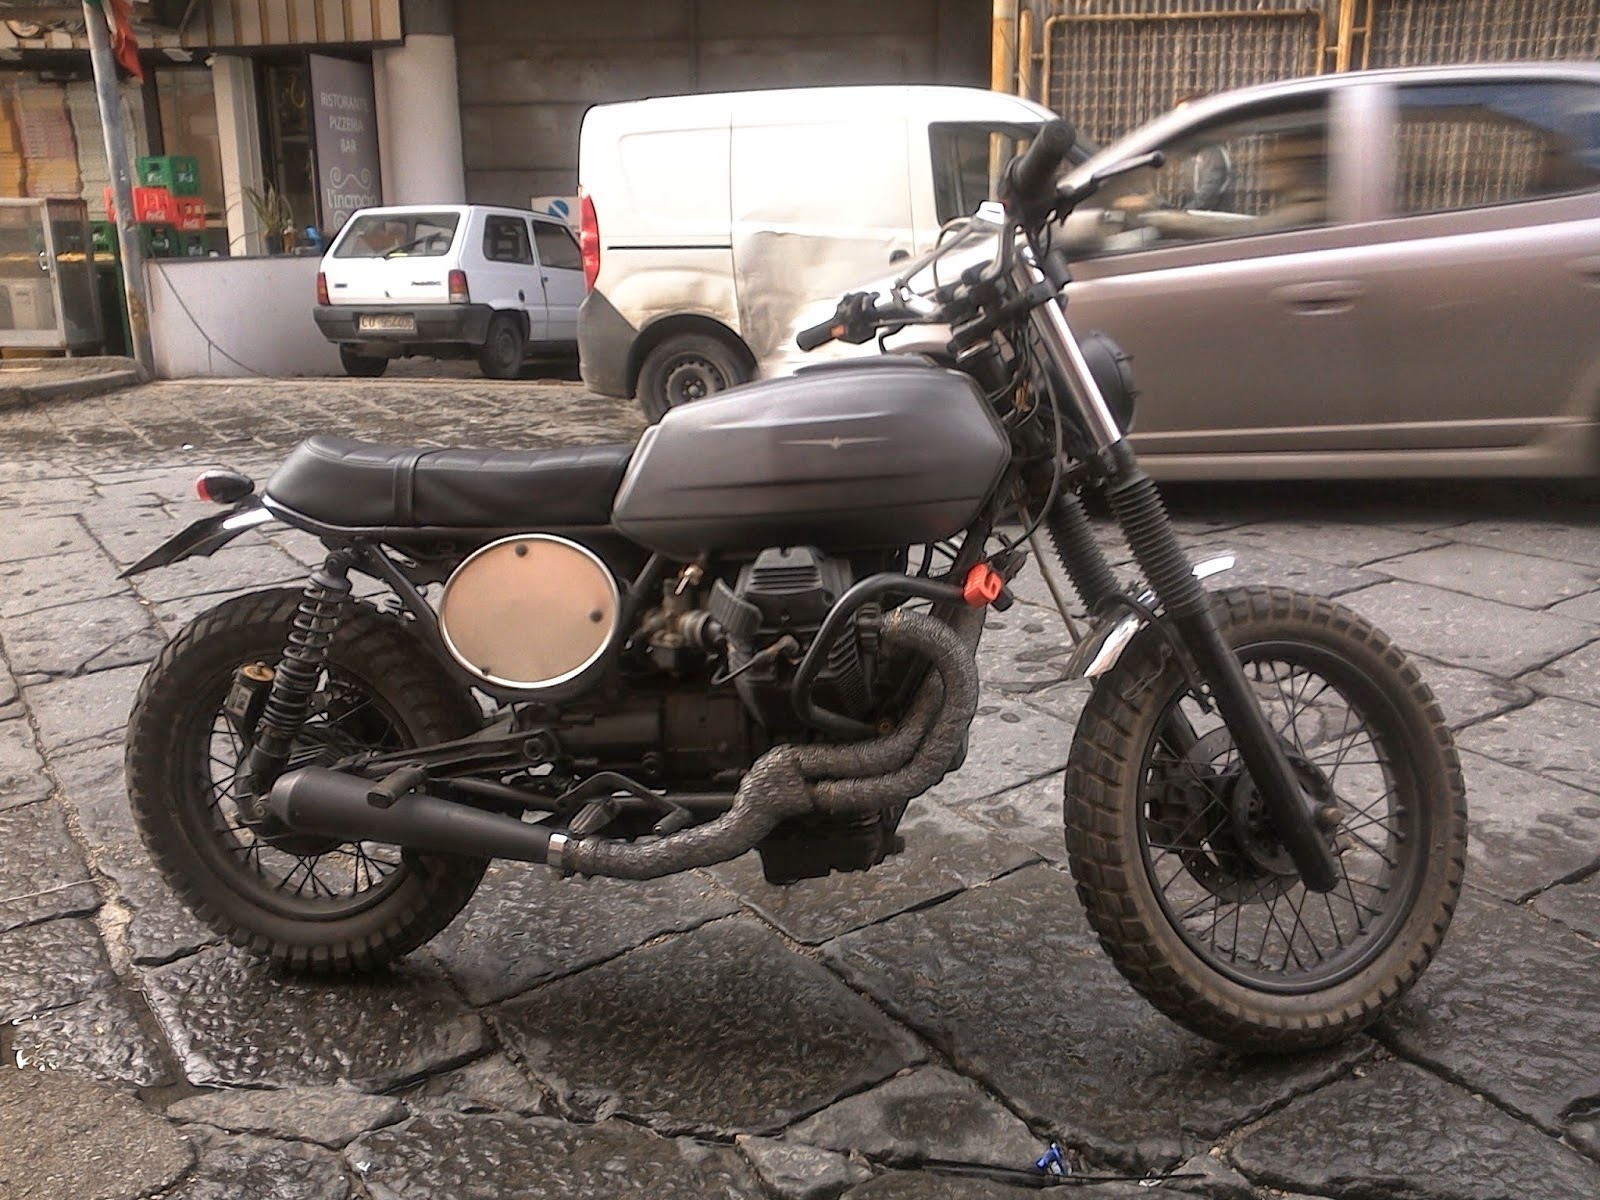 caf sport motorcycles tuning moto. Black Bedroom Furniture Sets. Home Design Ideas